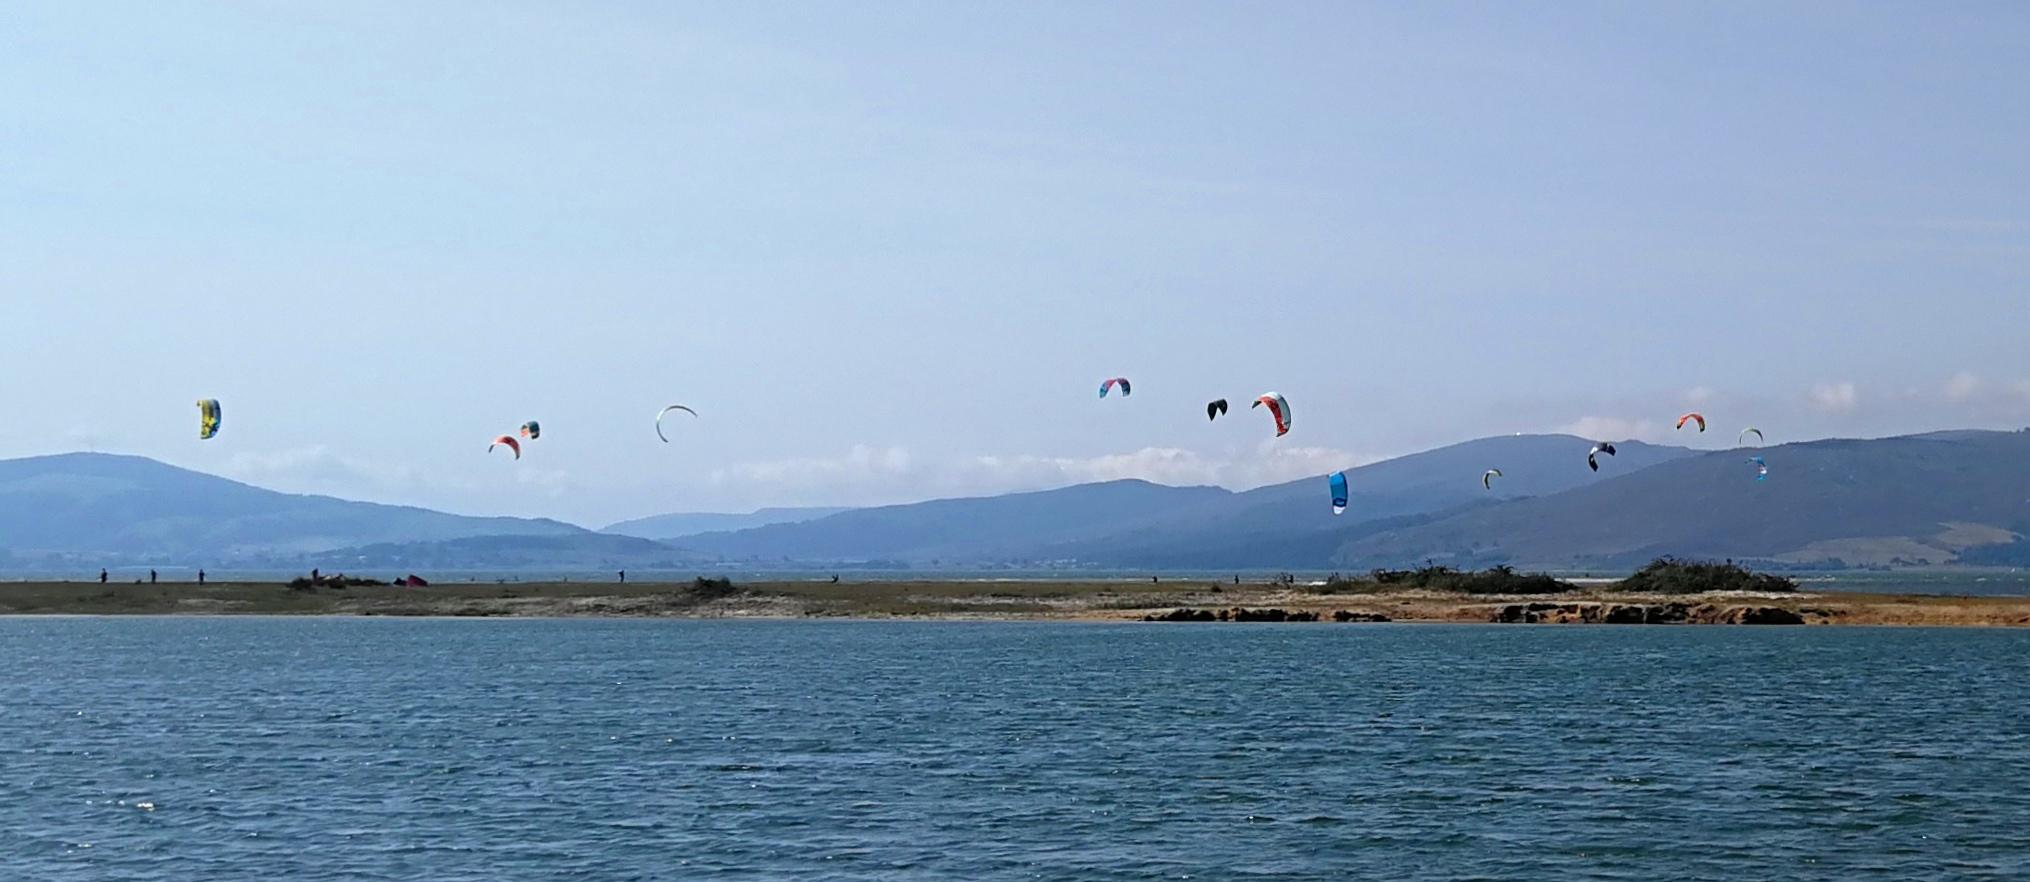 kite surf en Embalse del Ebro